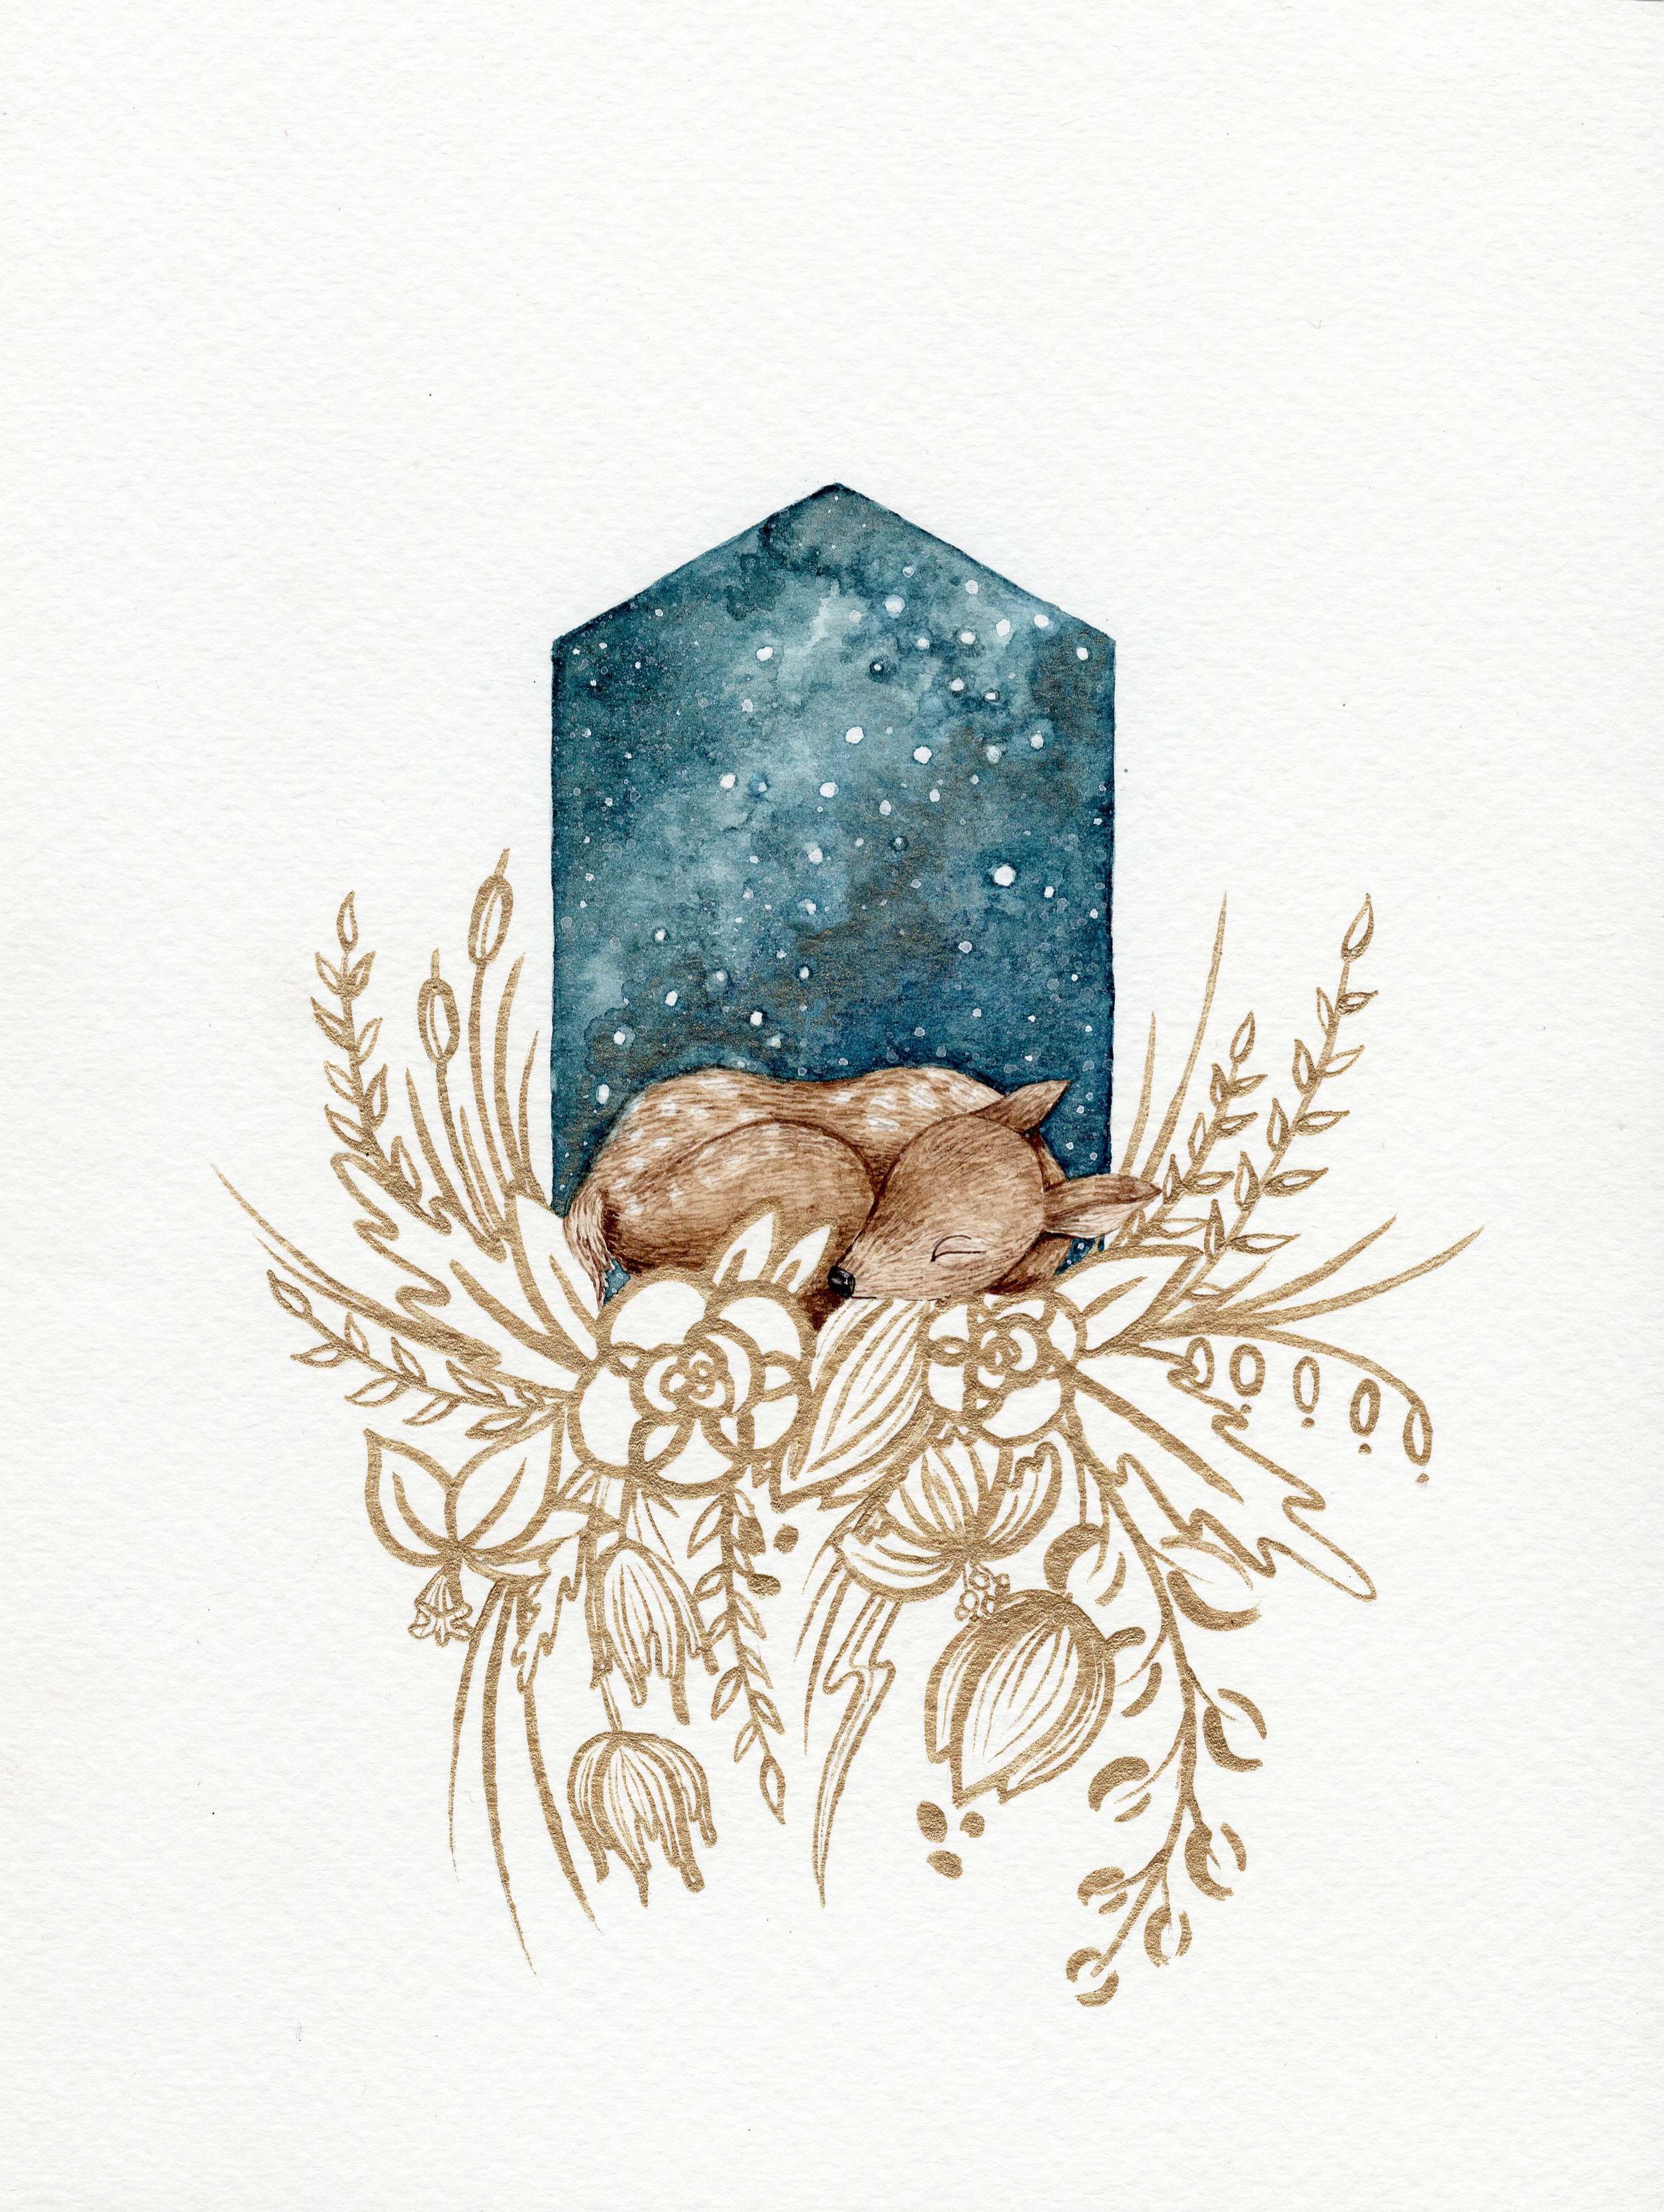 Asleep with the Stars - Deer